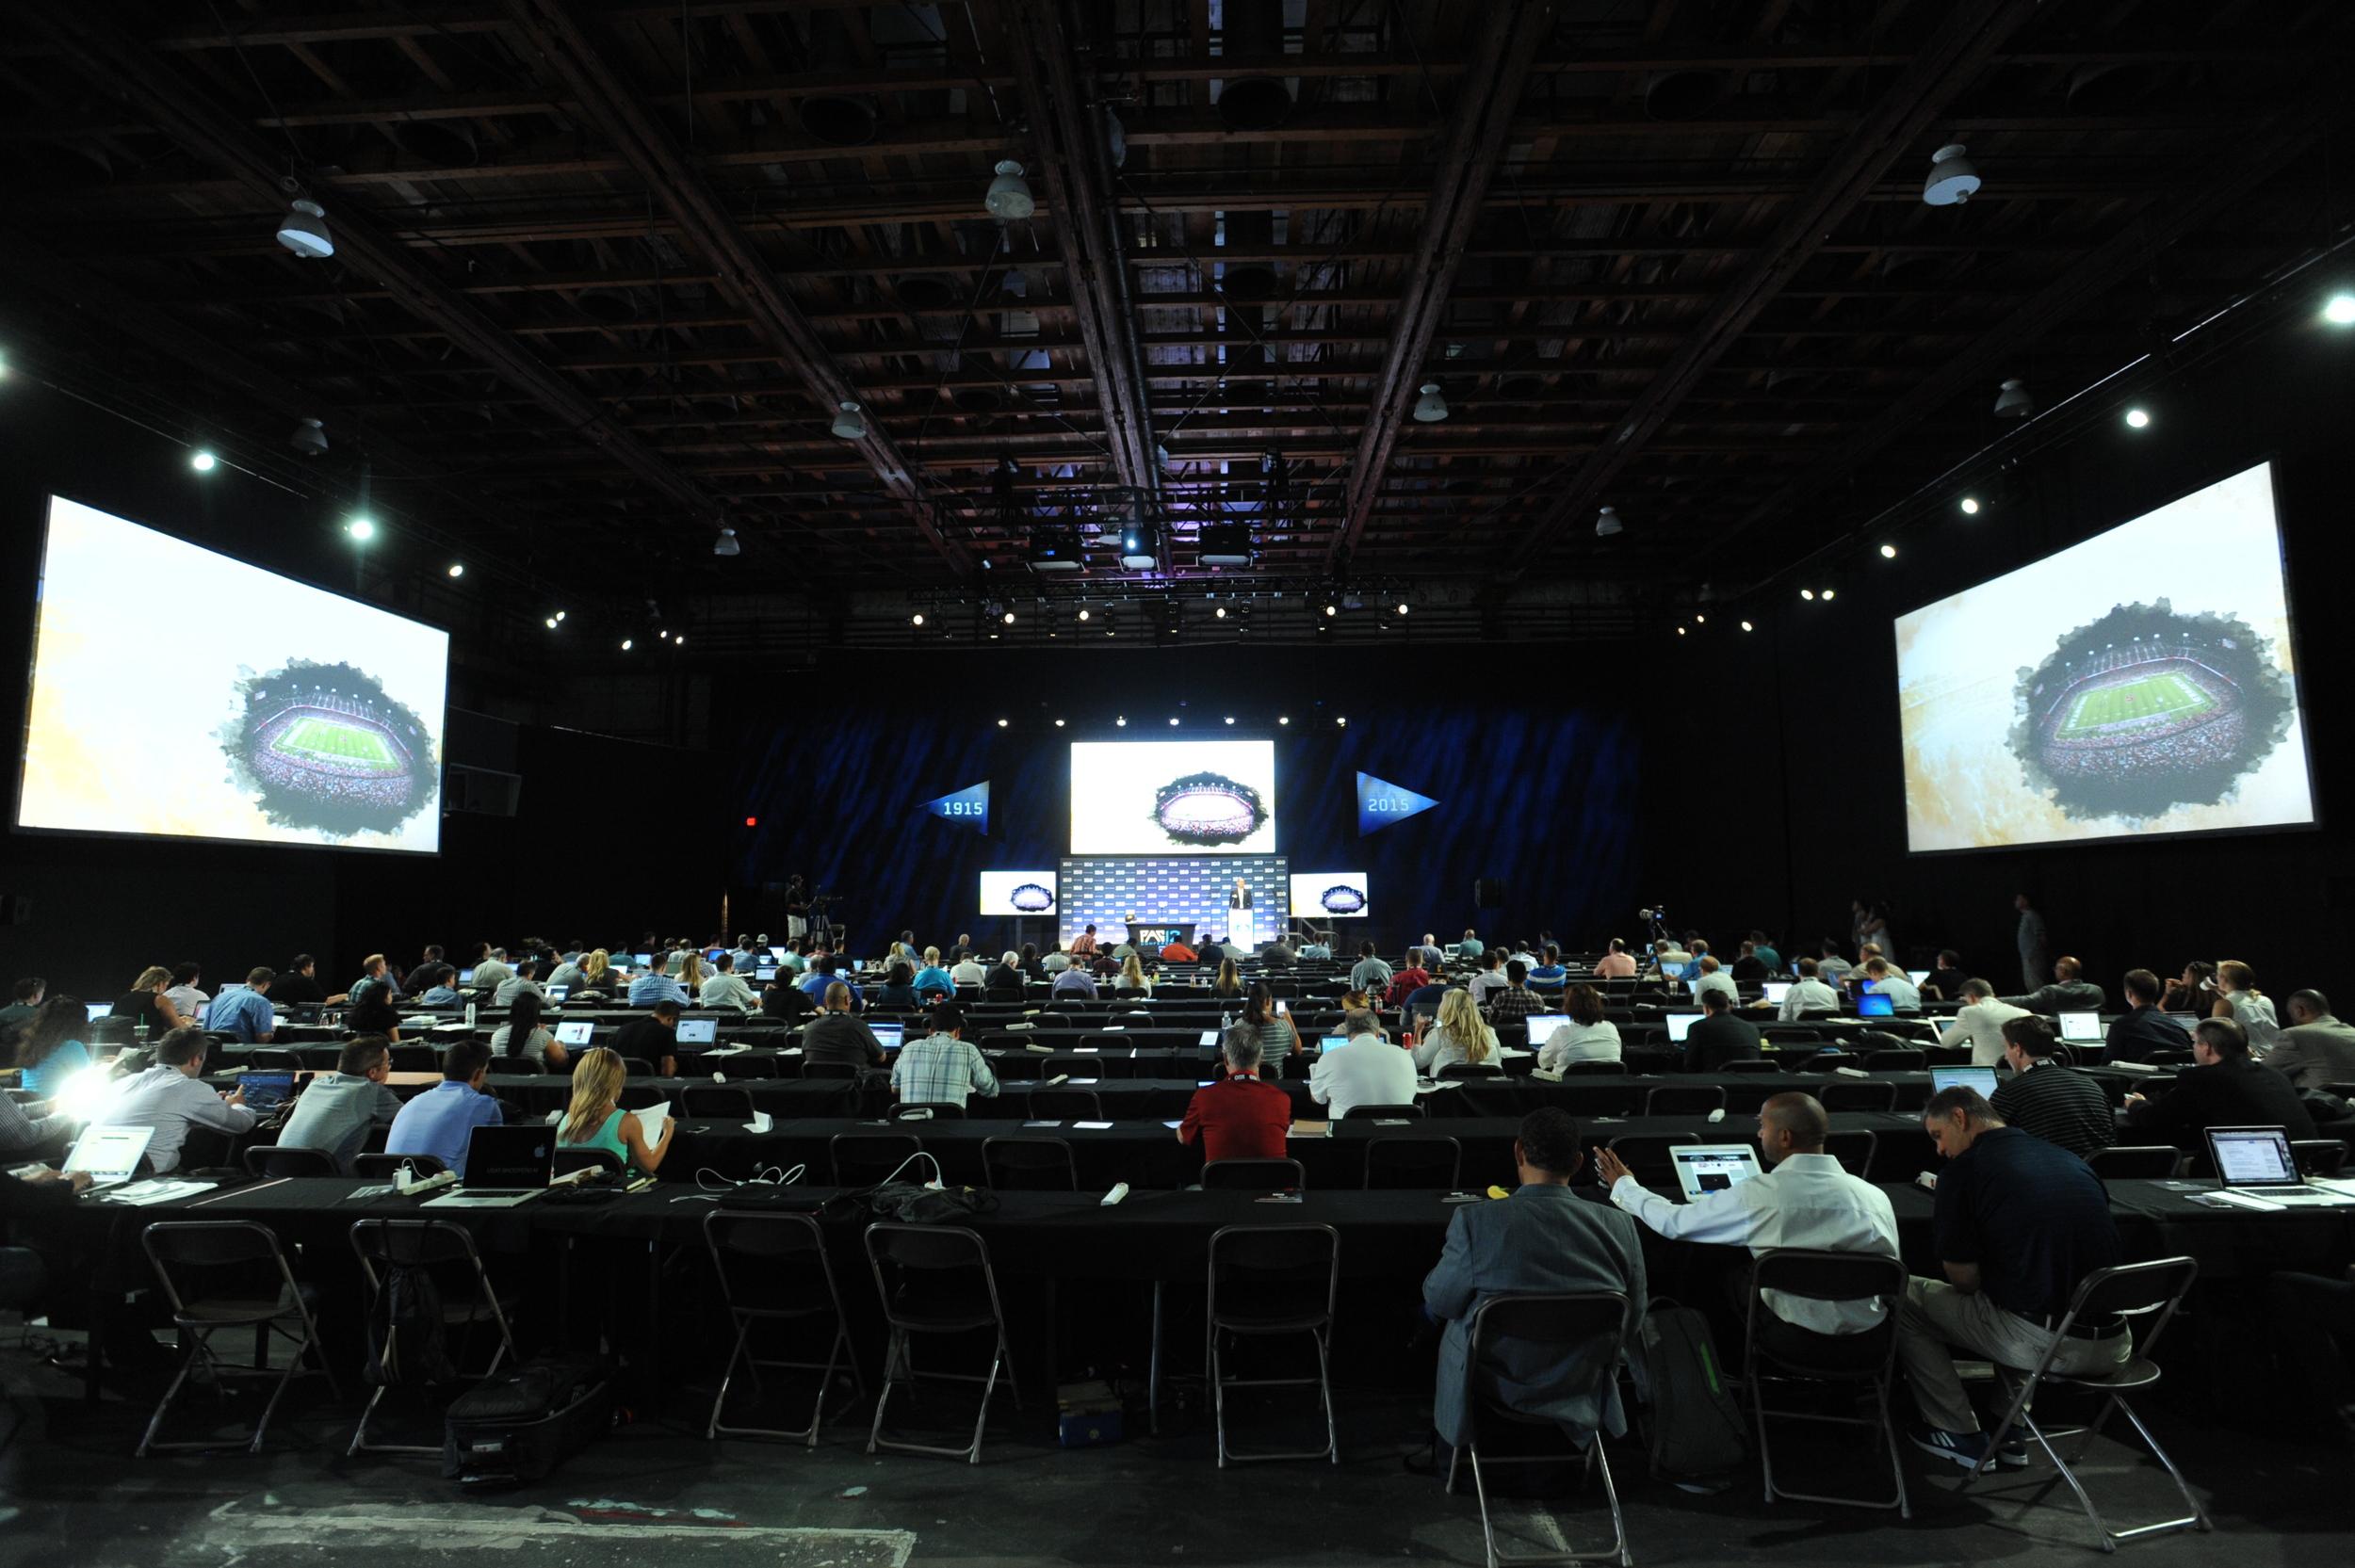 Juan Ocampo - Pac-12 Conference (325).JPG